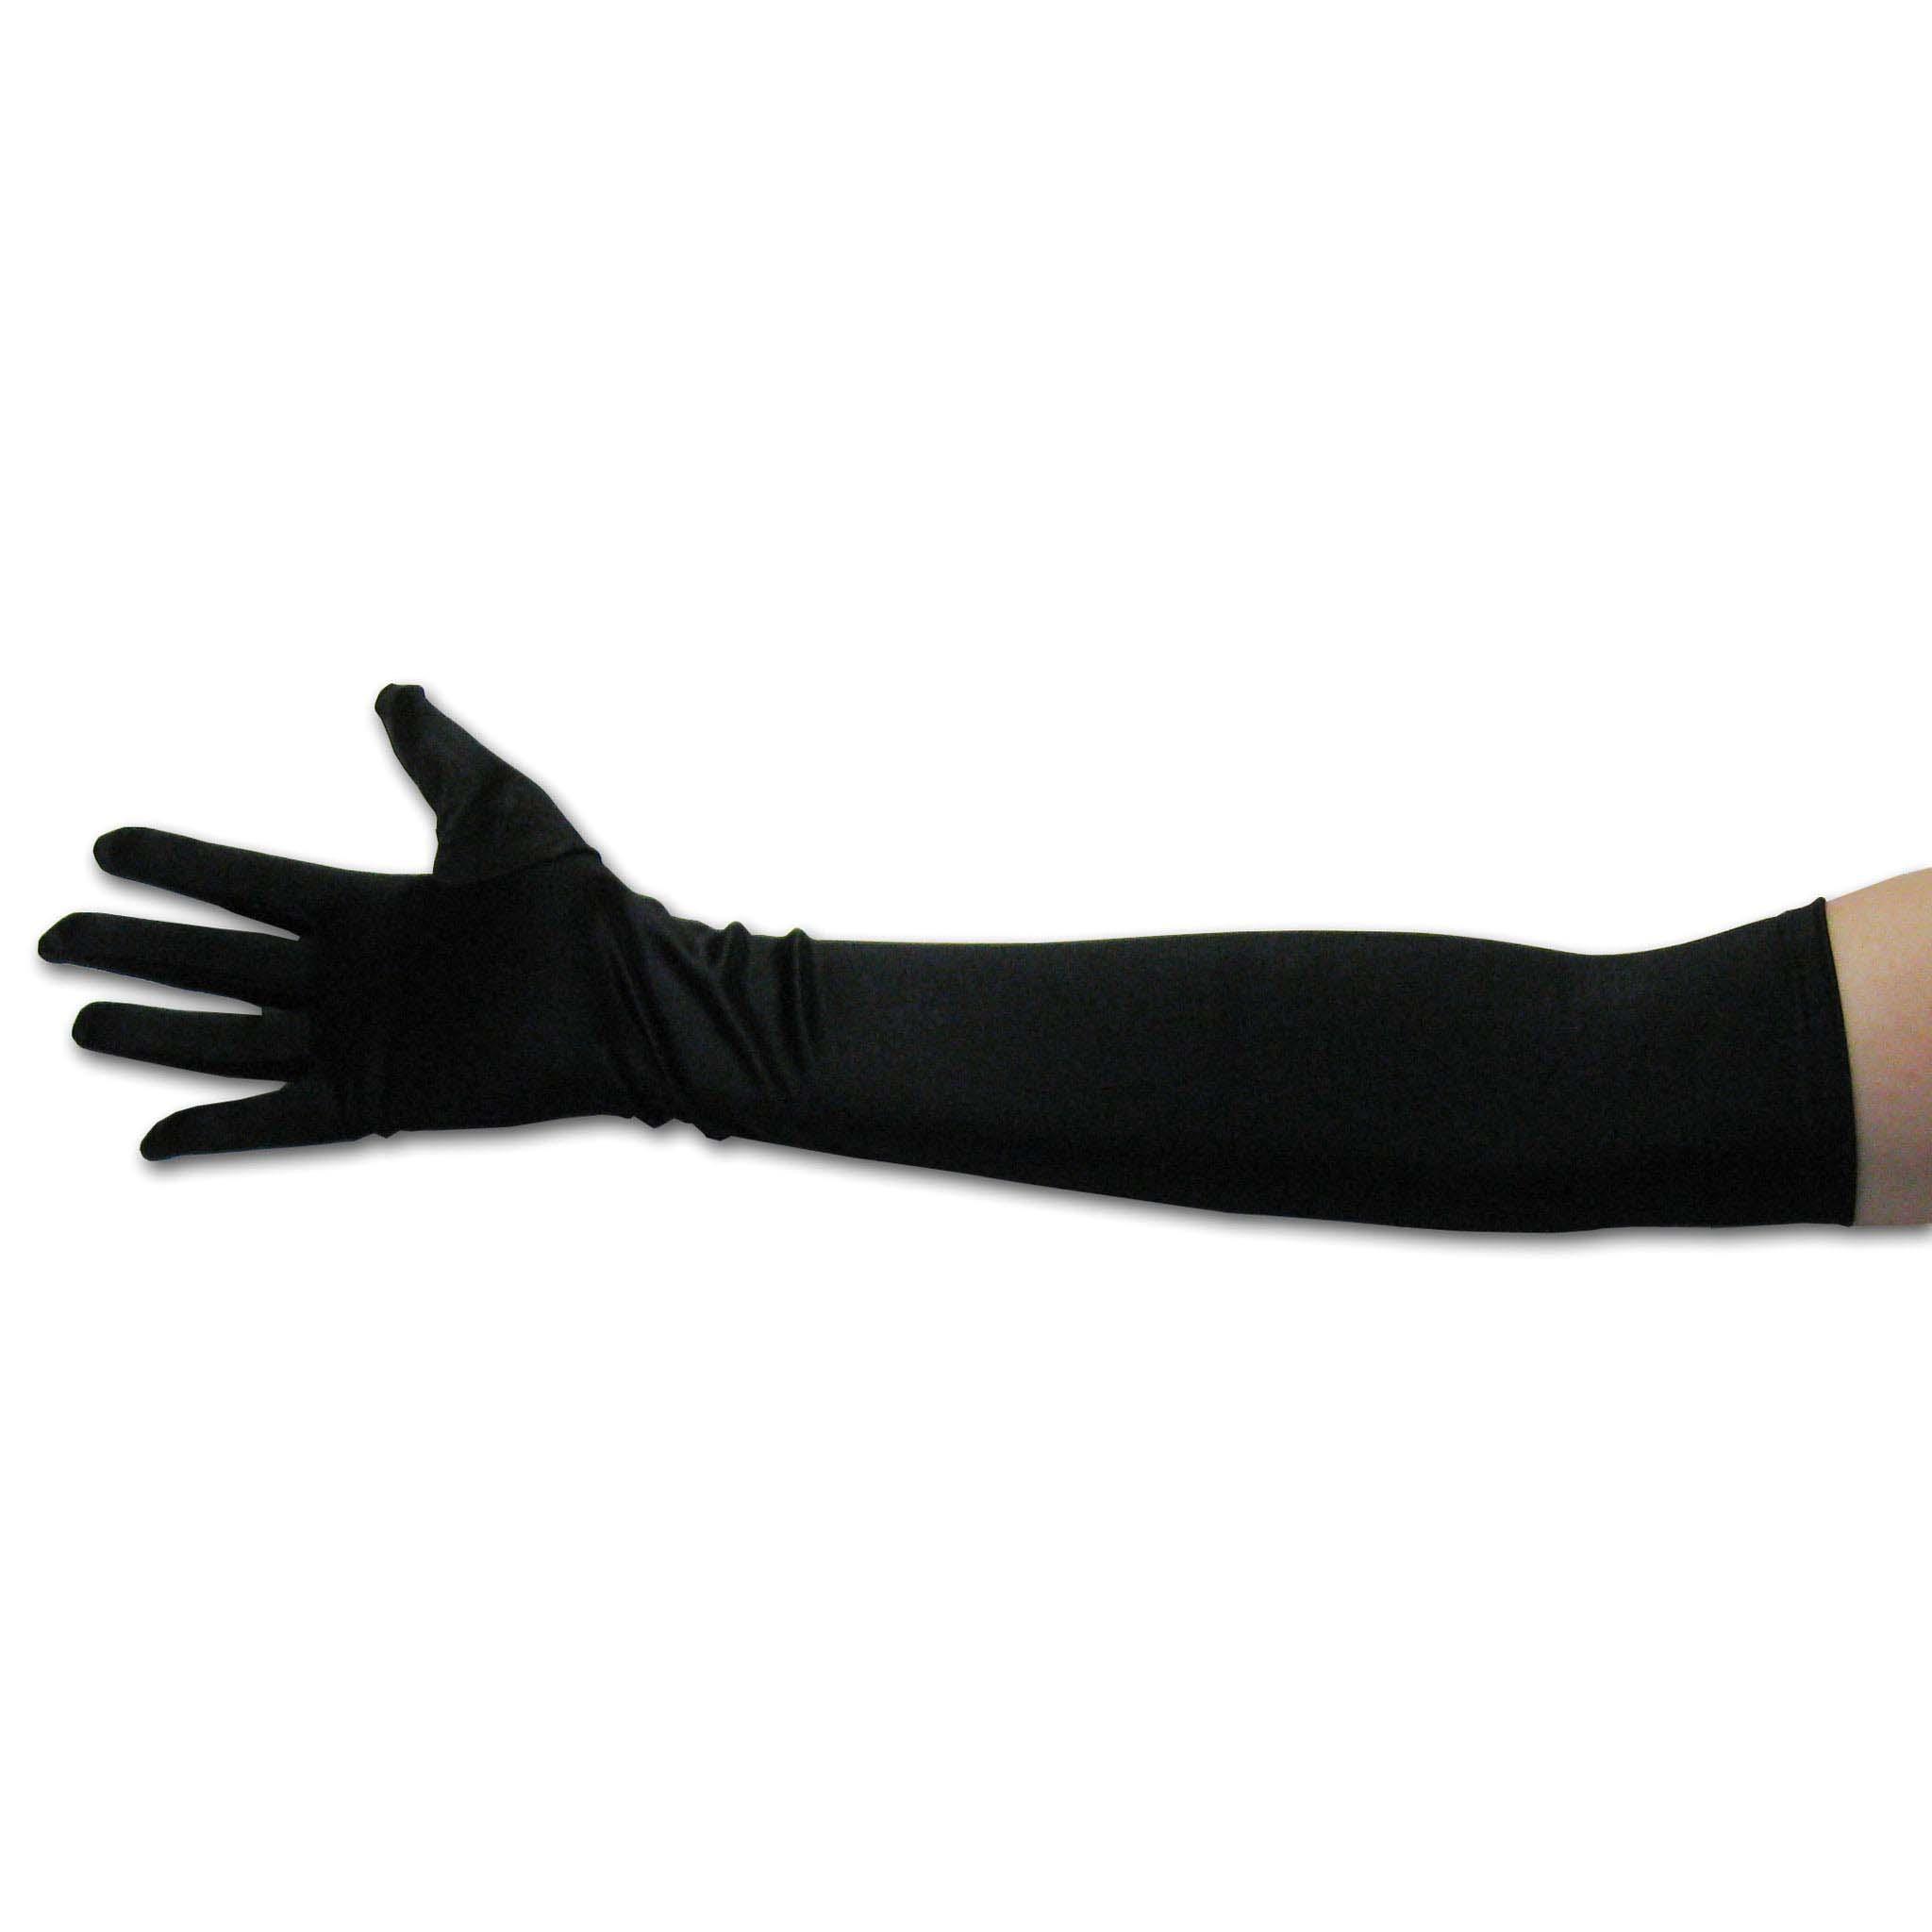 Long black gloves amazon - 22 034 Classic Adult Size Opera Length Satin